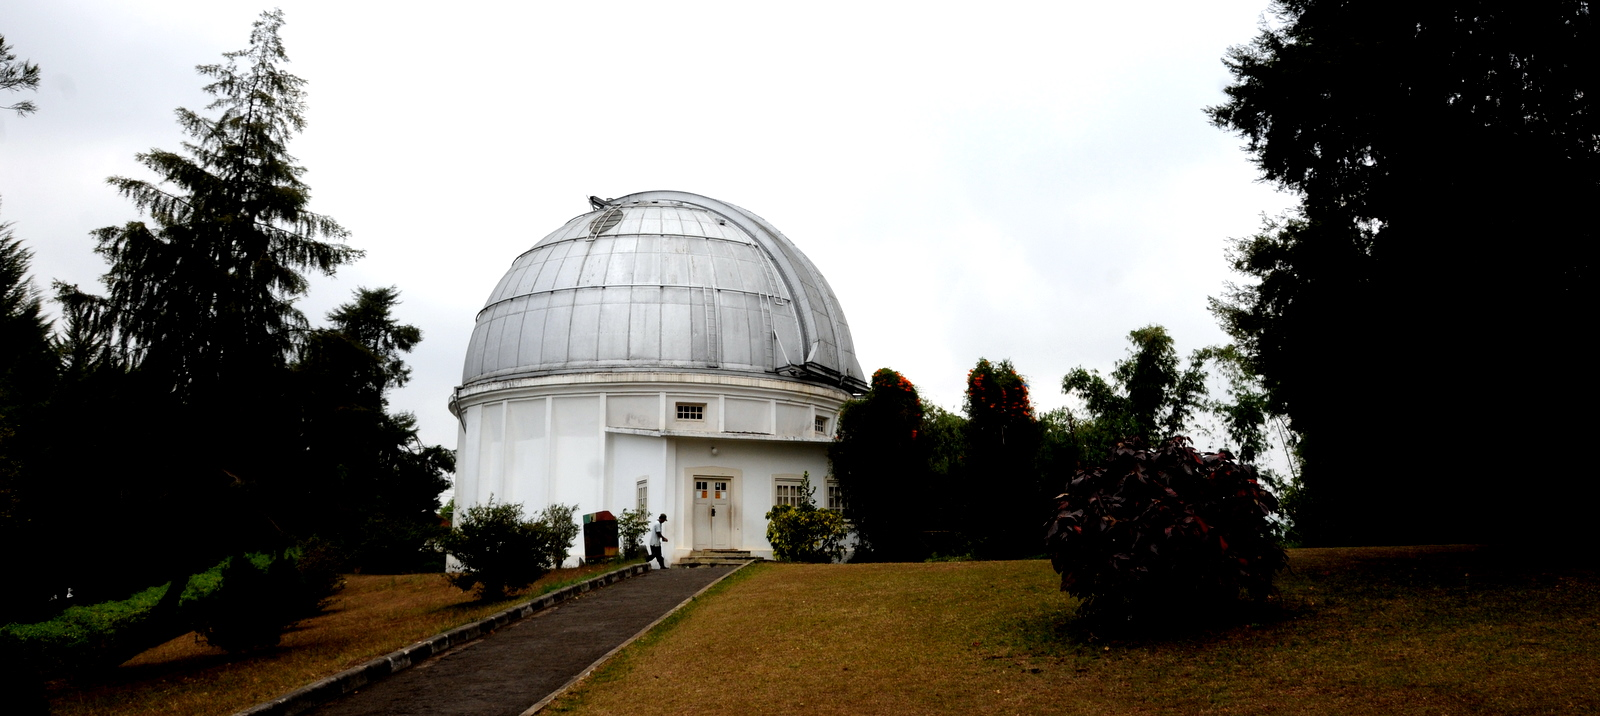 30 Tempat Wisata Populer Bandung Vebma Bosscha Observatory Fmipa Institut